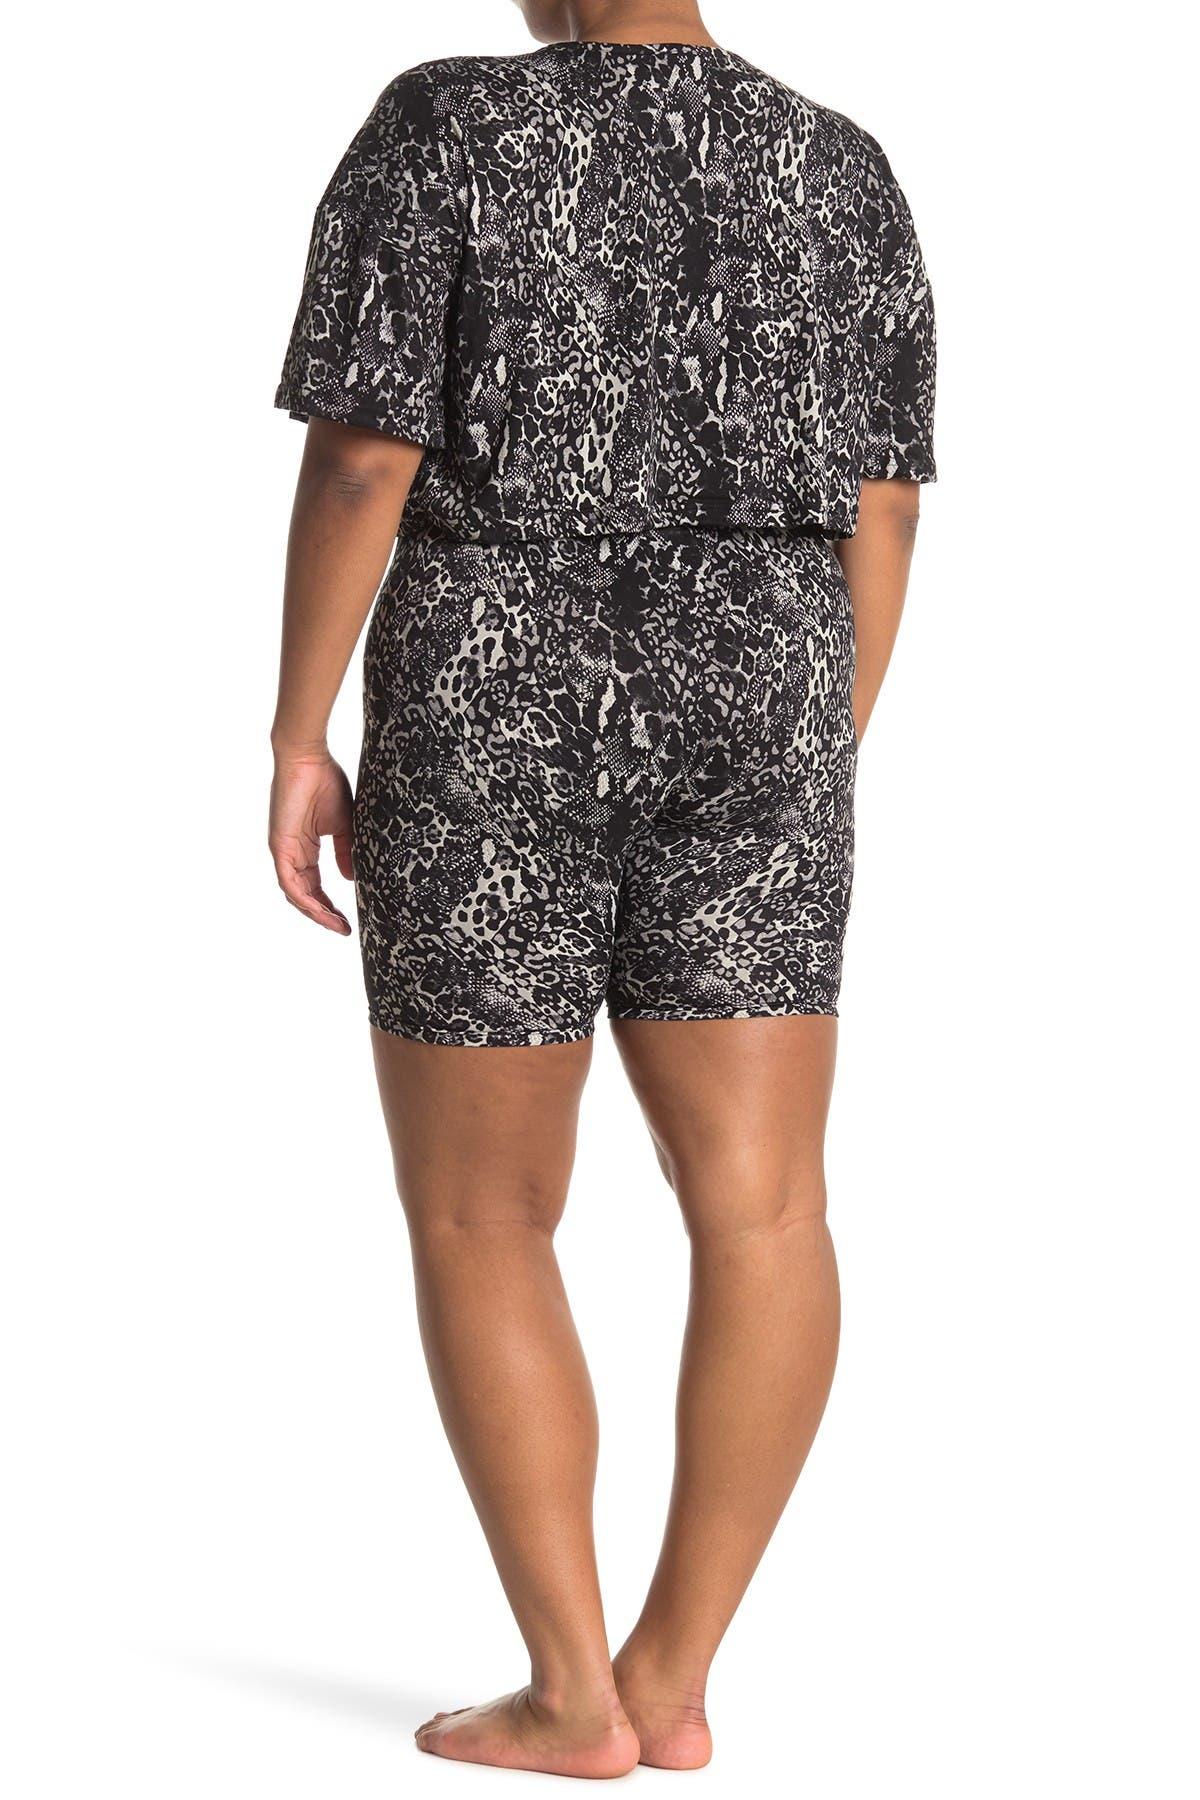 Image of FRENCH AFFAIR Snake Skin Print T-Shirt & Bike Shorts Pajama 2-Piece Set